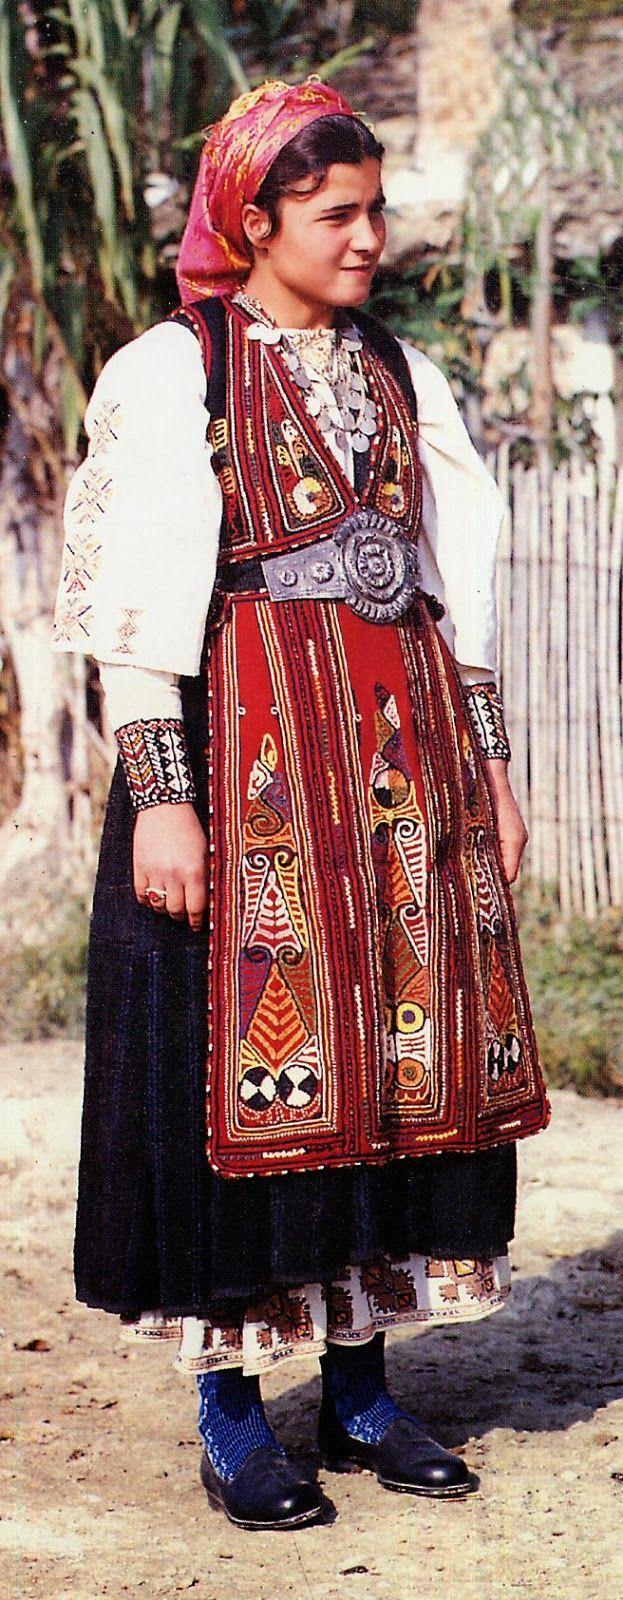 FolkCostume&Embroidery: Costume of the Karagouni, Thessaly ...